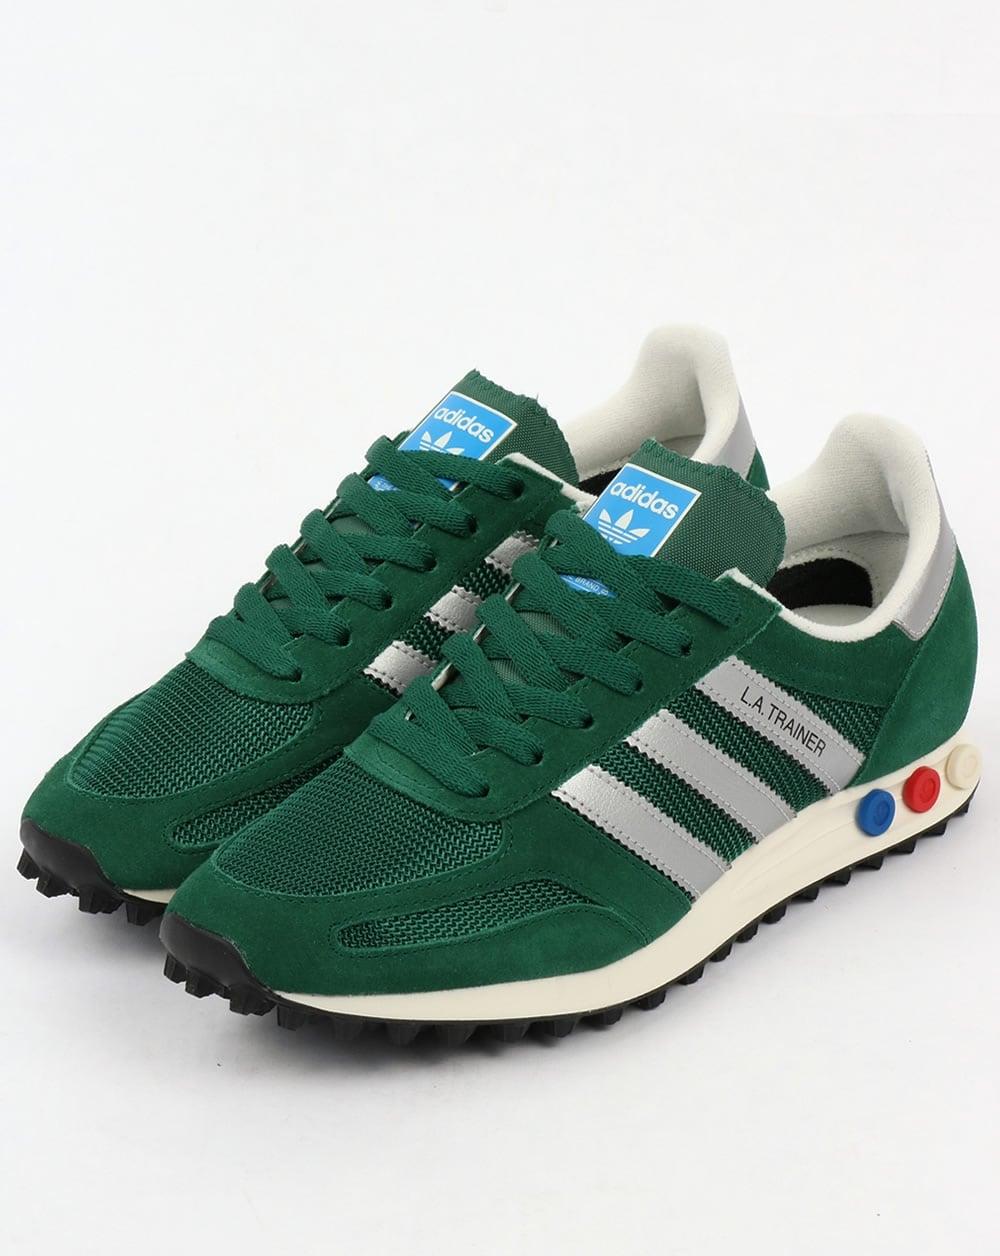 Adidas La Trainer Og Green/silver